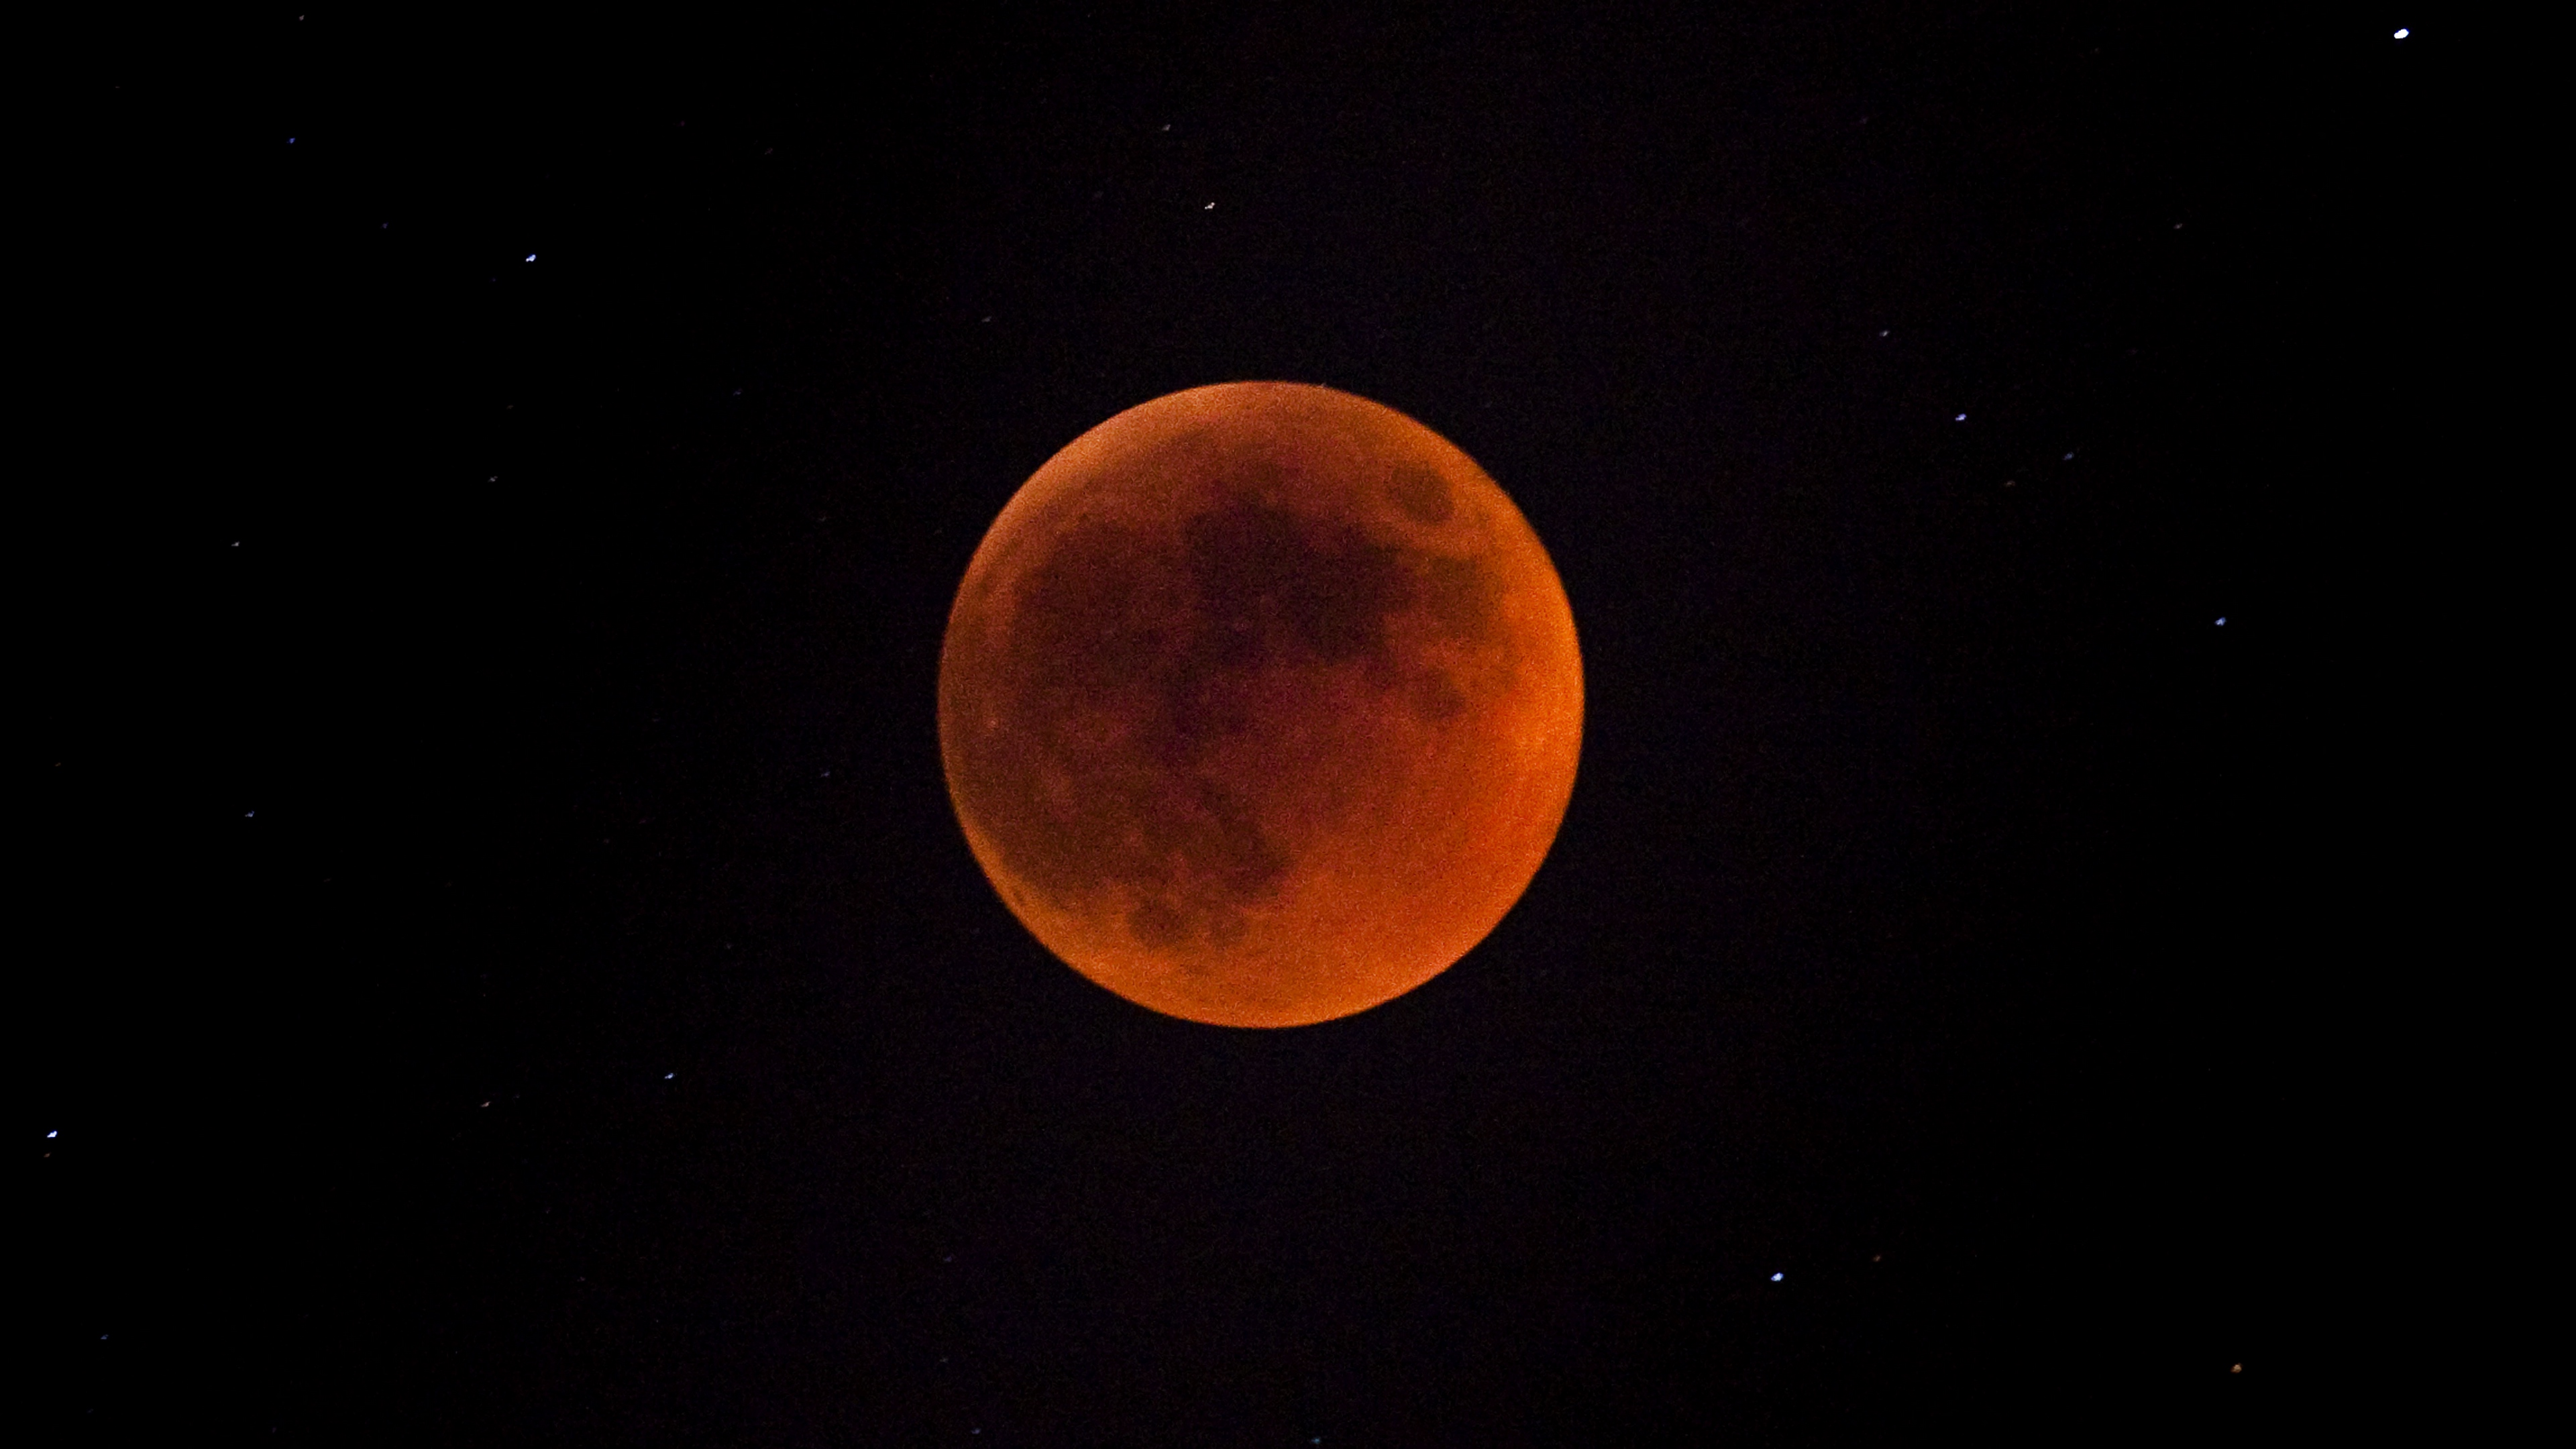 Wallpaper 4k Lunar Eclipse Eclipse Moon 4k Eclipse Lunar Eclipse Moon